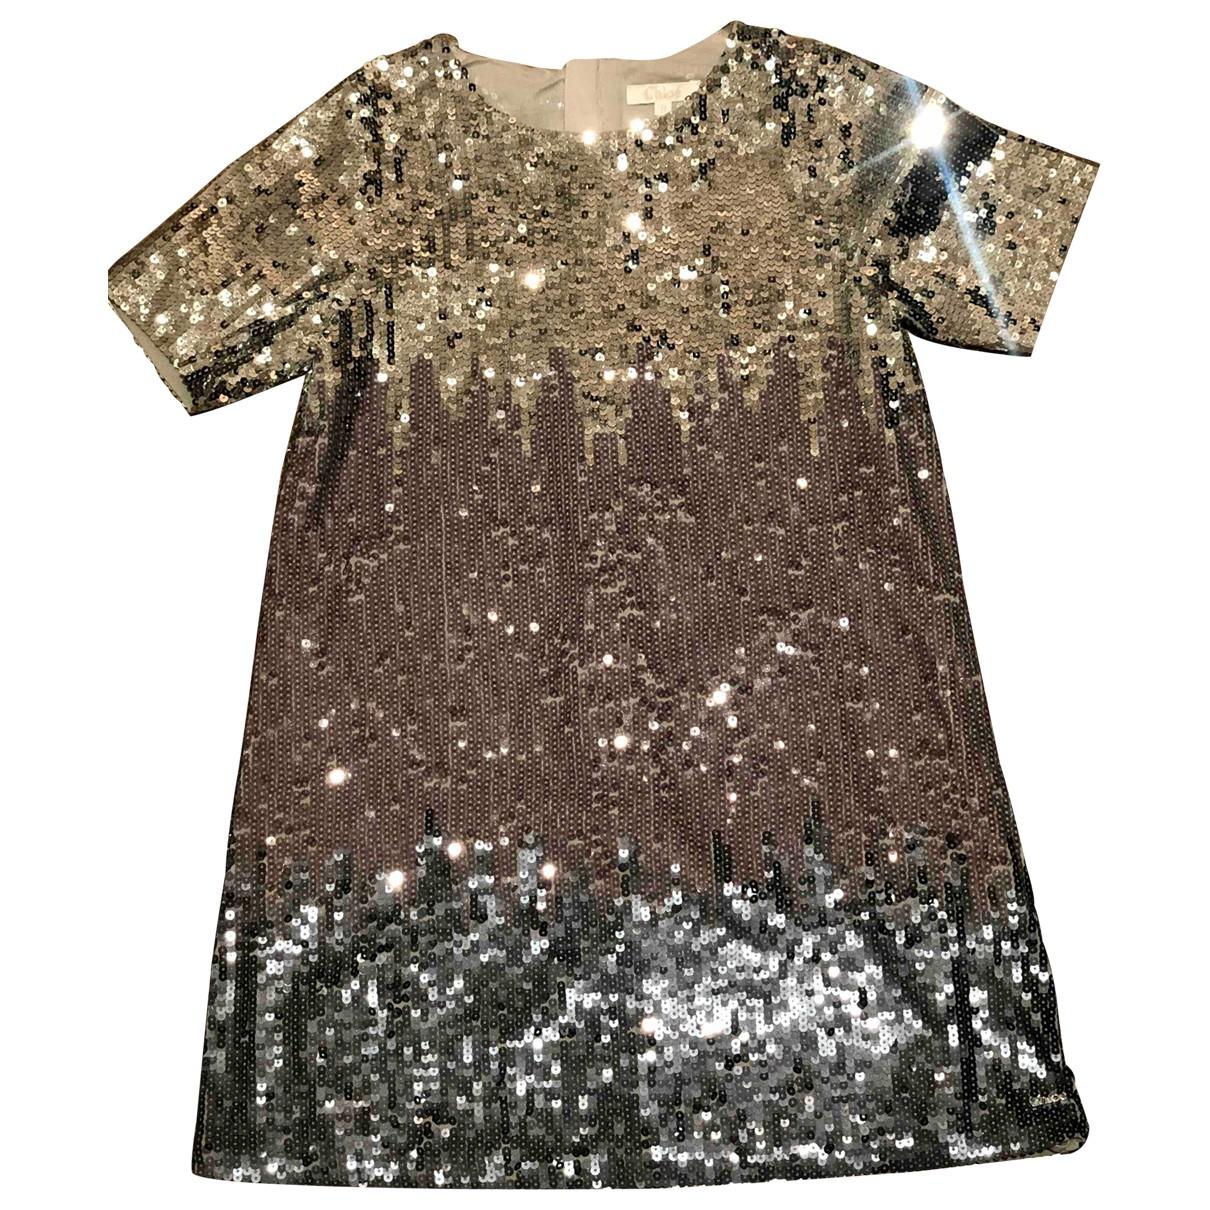 Chloe \N Kleid in  Metallic Mit Pailletten